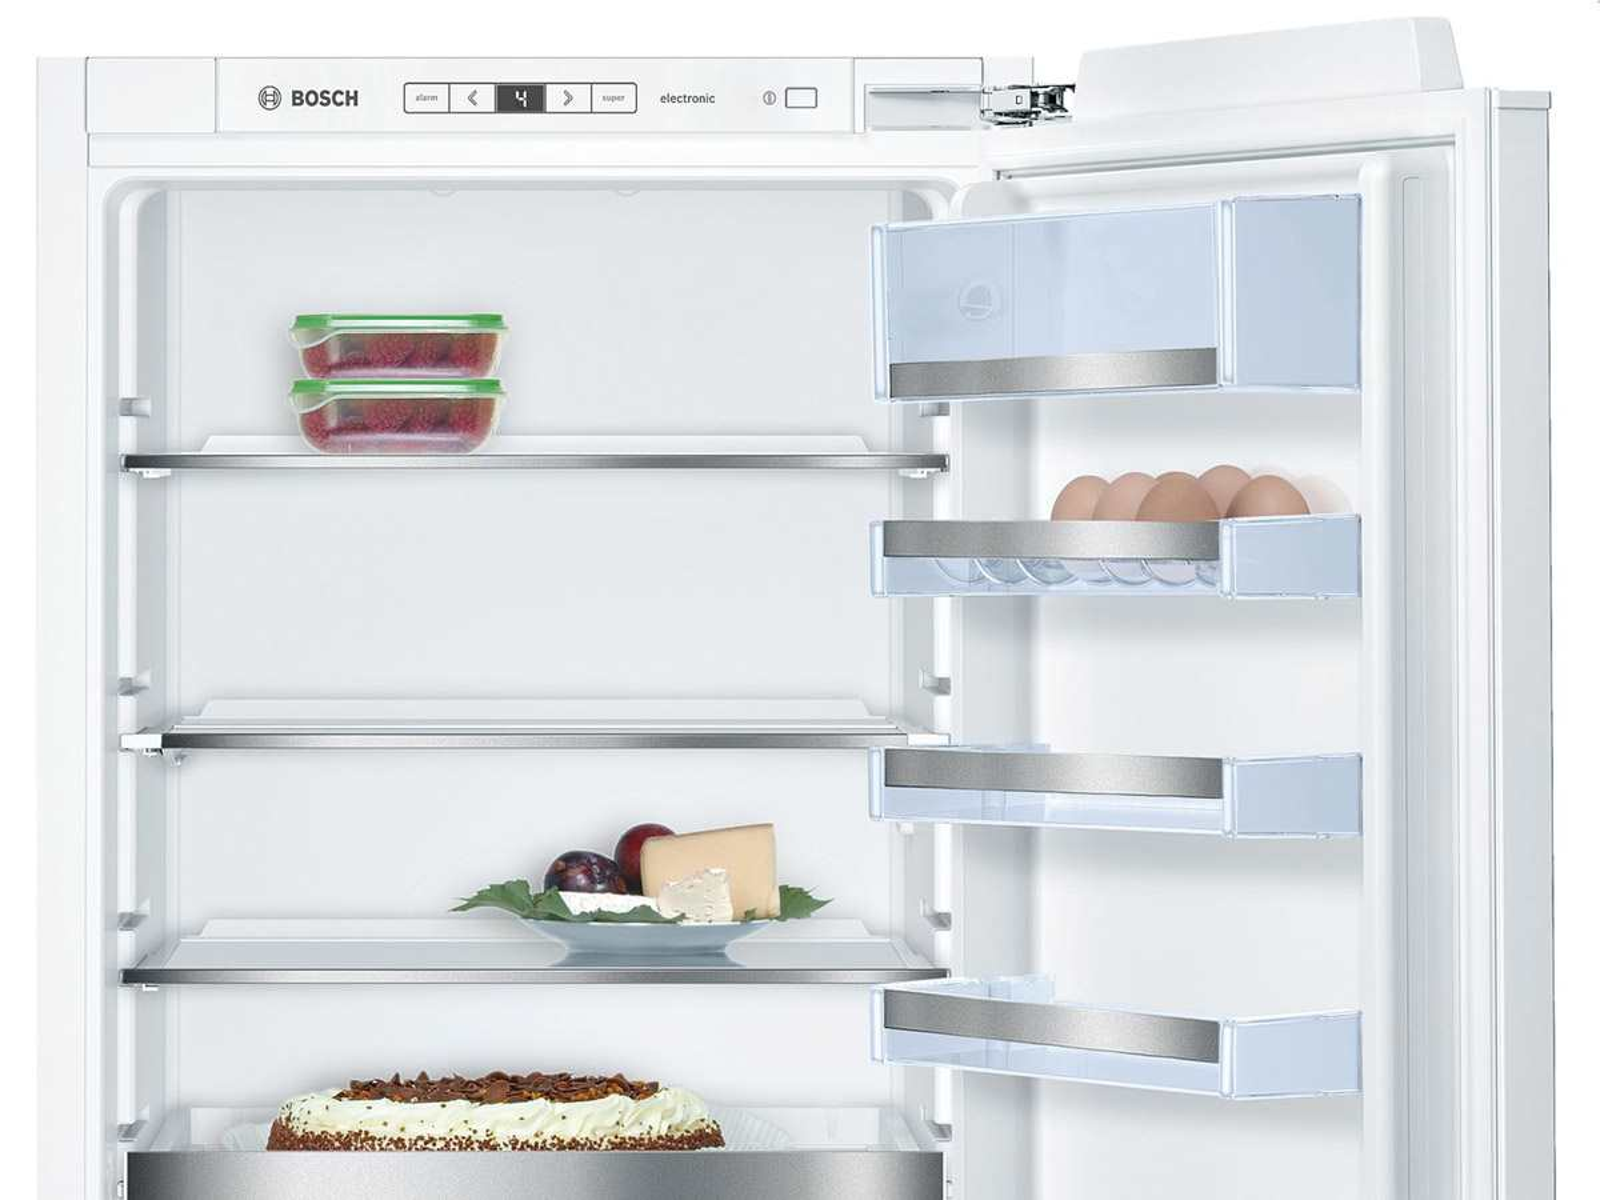 Bosch kir31af30 einbau kuhlschrank fur 49890 eur shop for Bosch kühlschrank